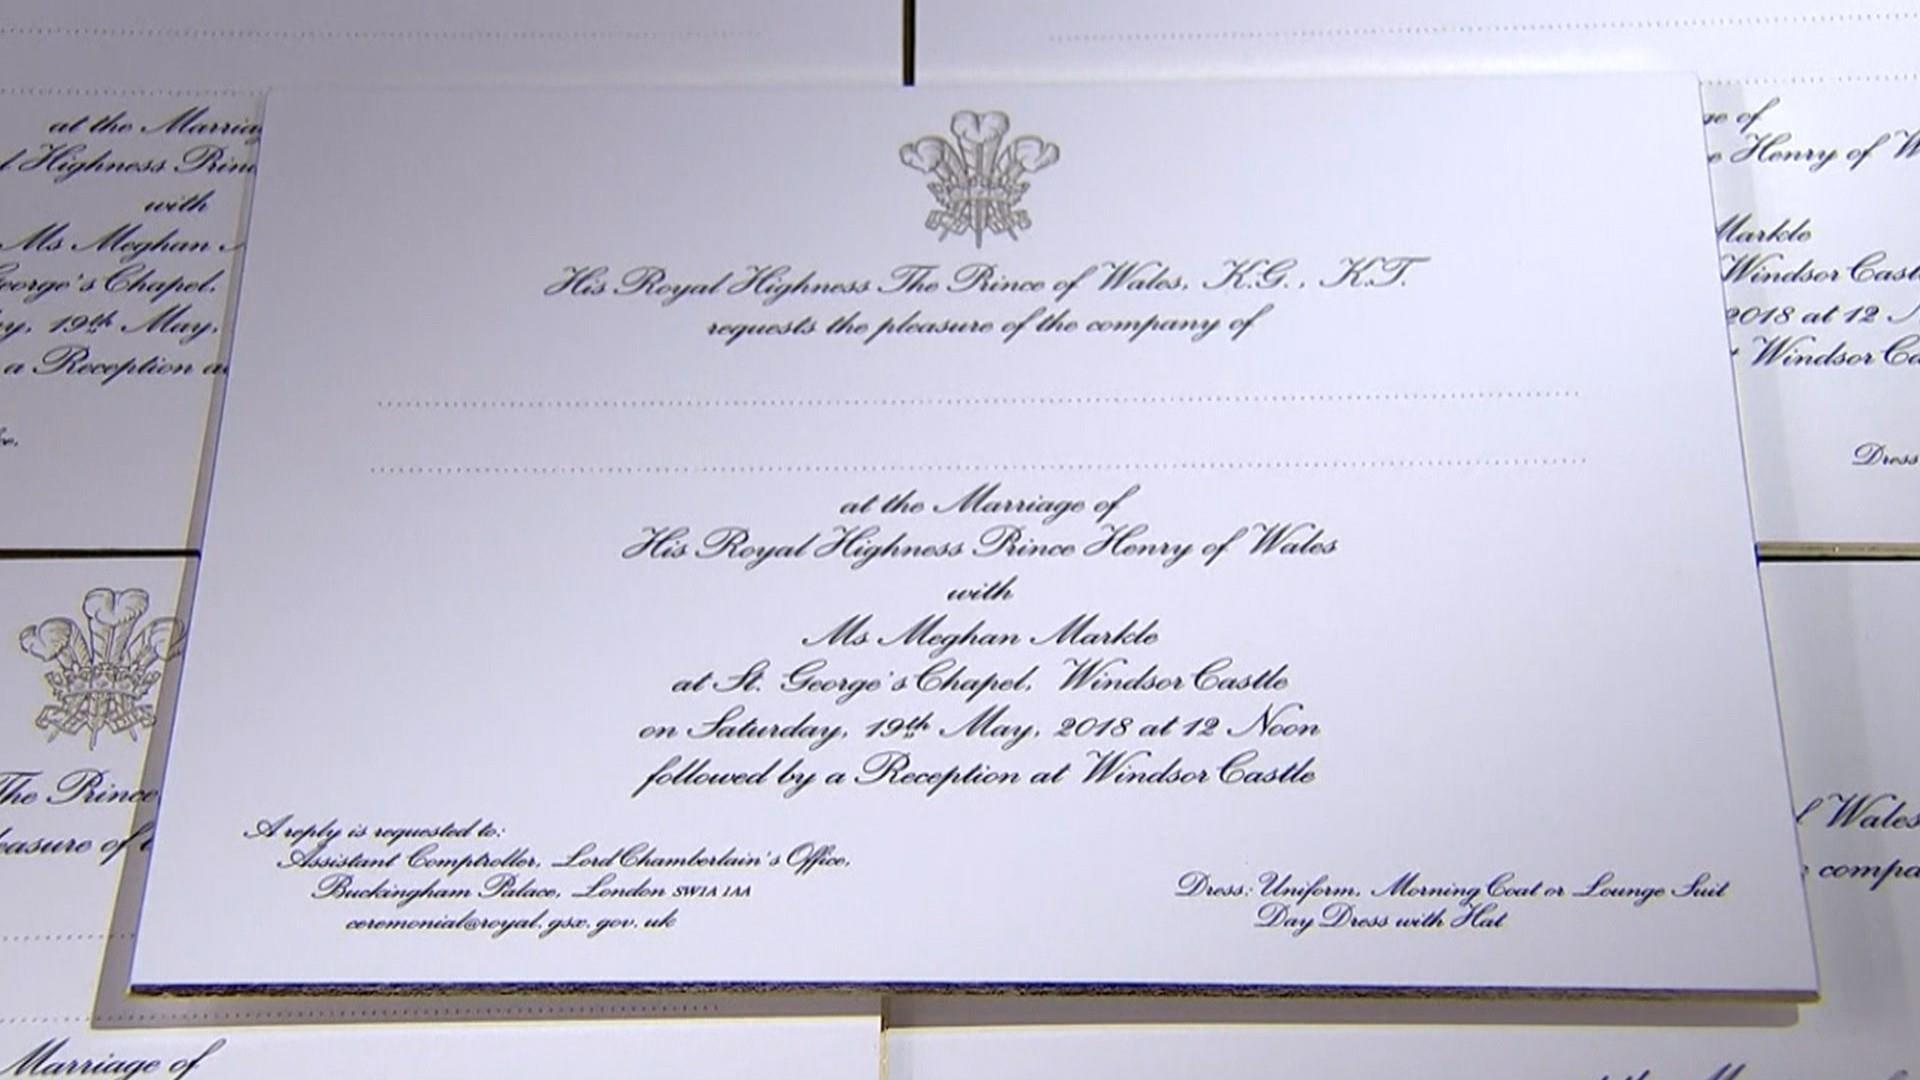 Trevor Rees Jones Invited Royal Wedding: Meghan Markle And Prince Harry's Wedding Invitation Is